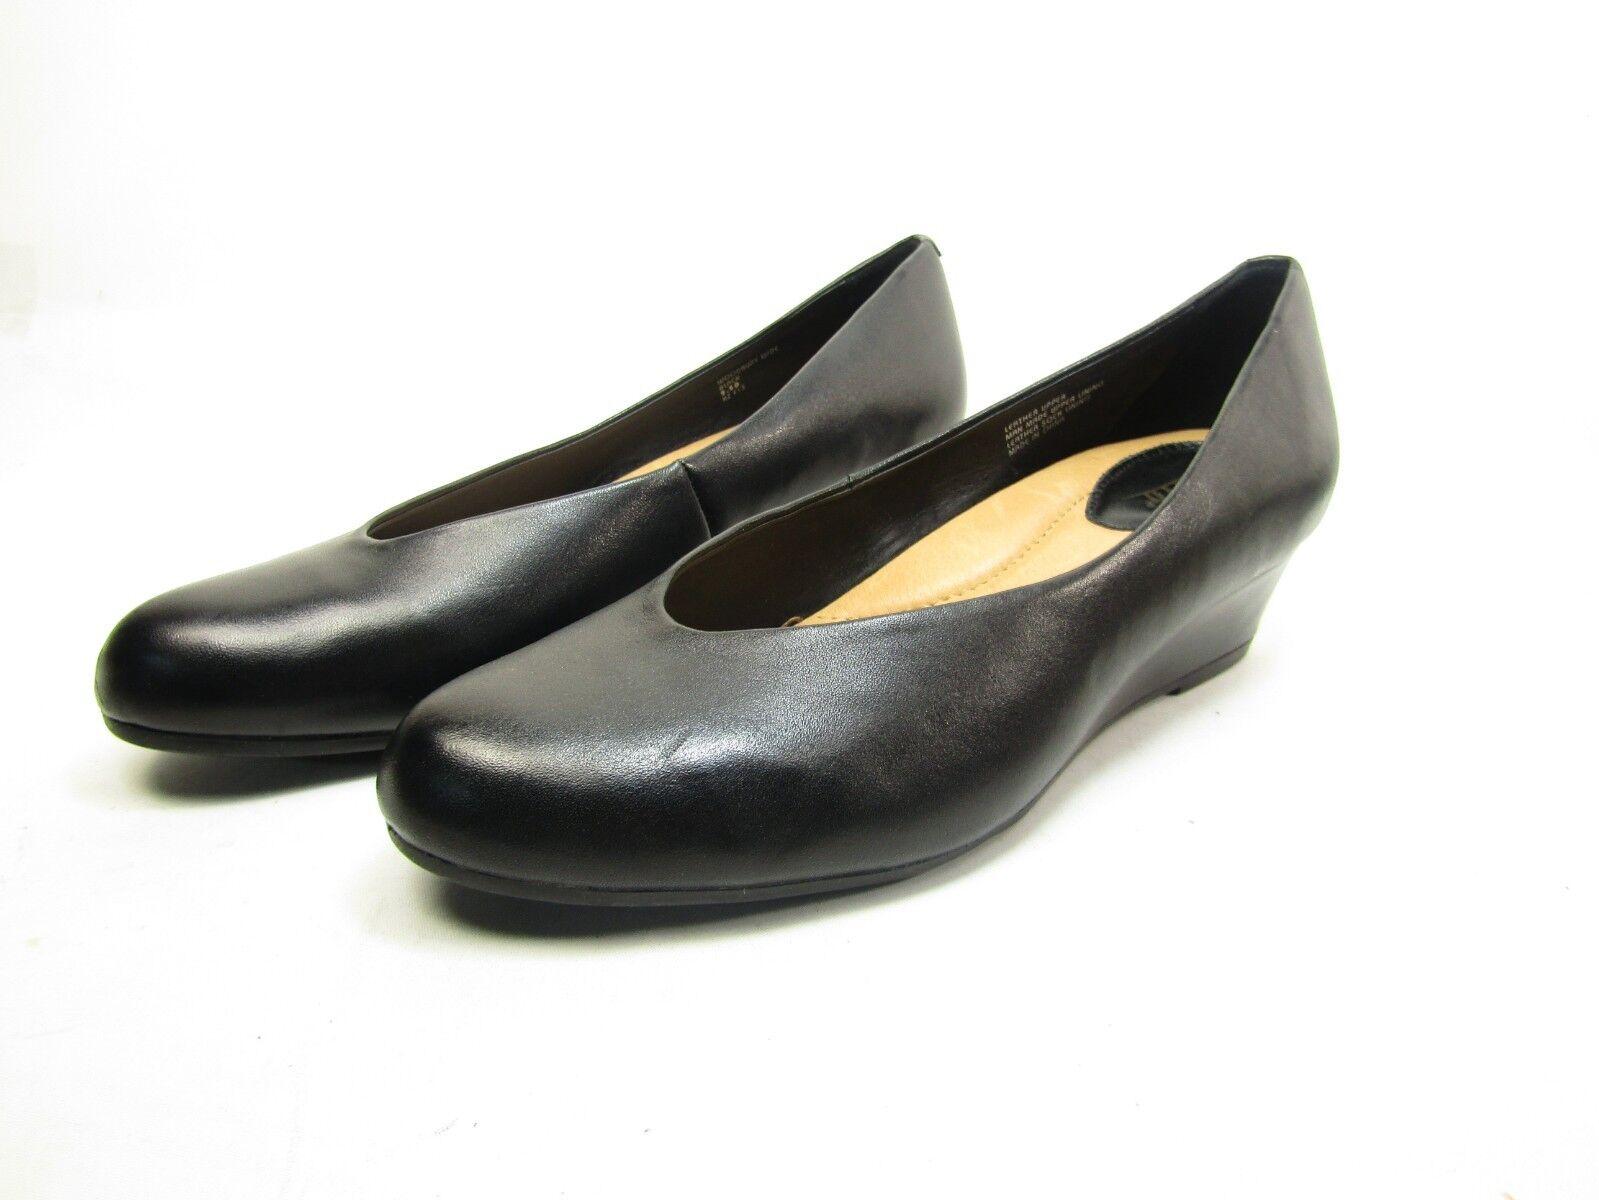 Earth Woodbury Bark Full Grain Leather (Women's) Black  Size 9.5D